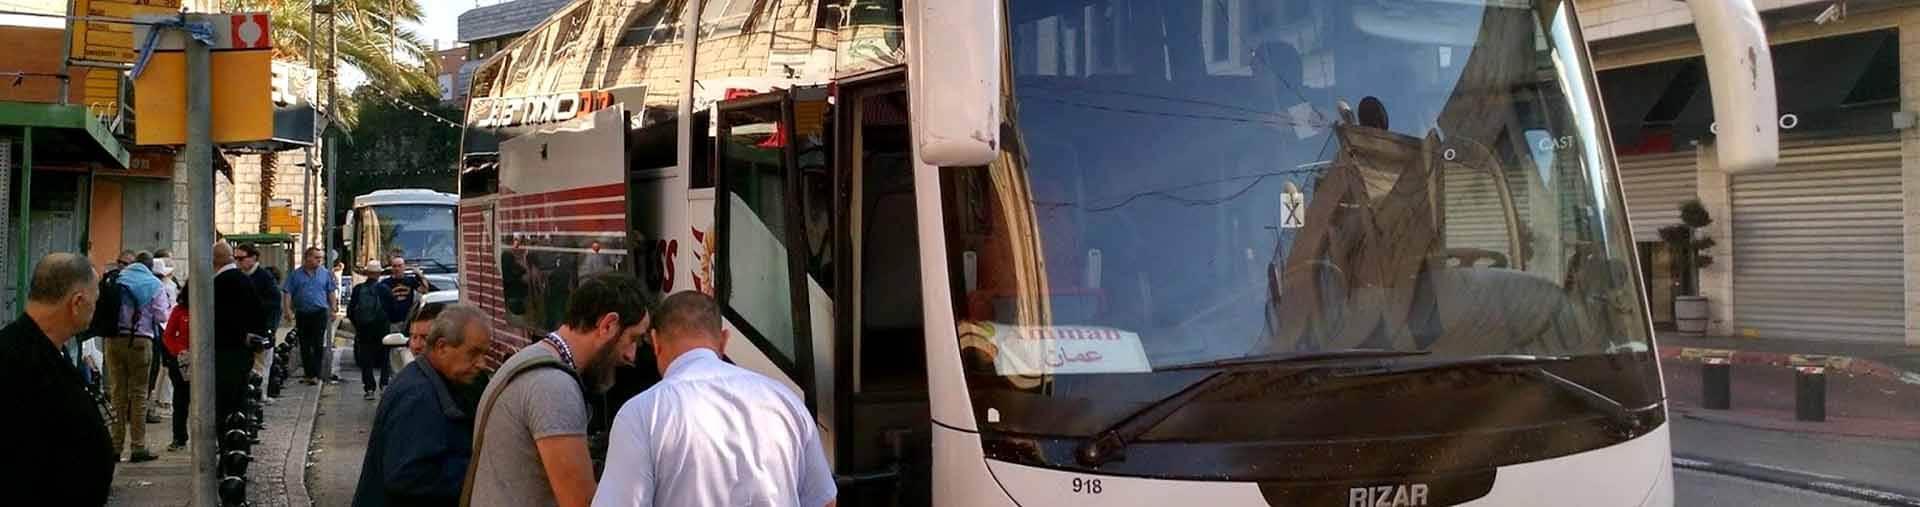 Transfer Nazareth with abraham tours